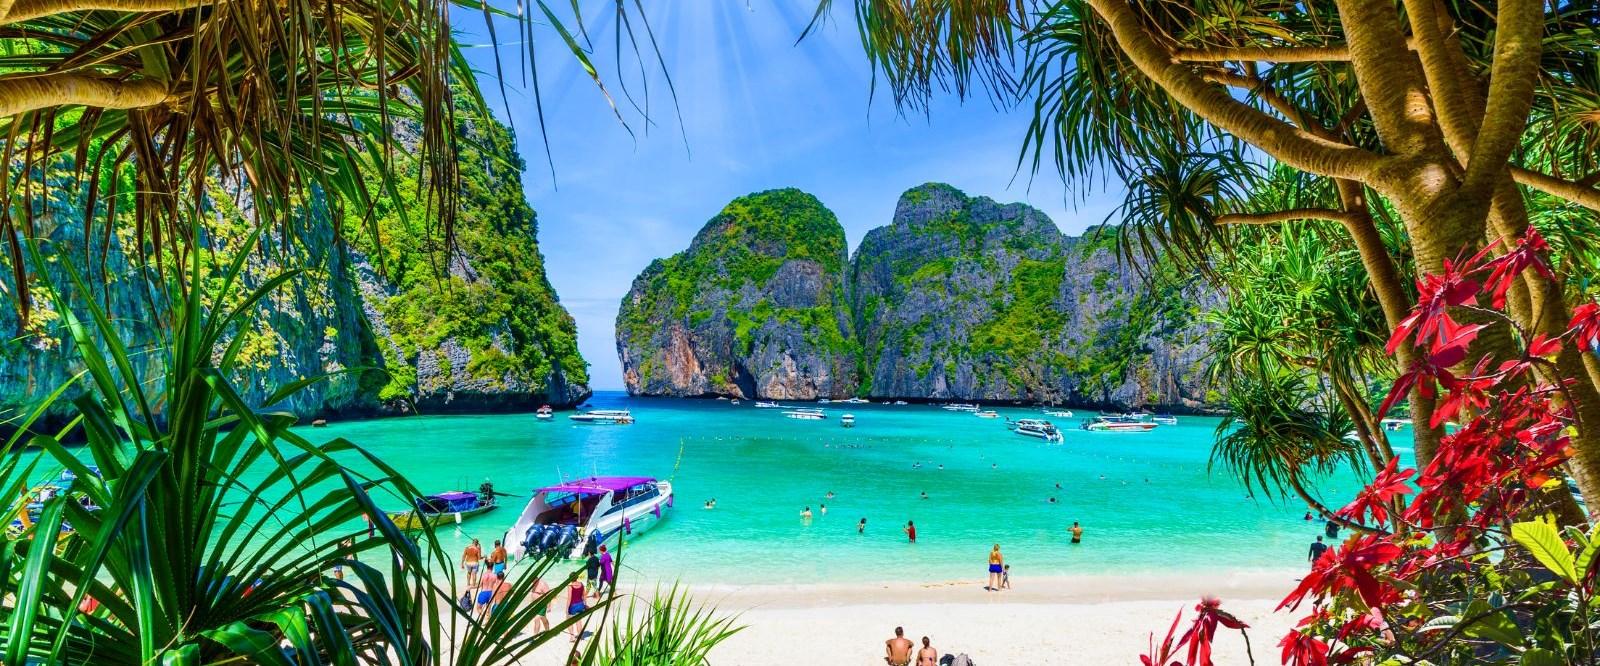 Tayland-Maya-Plaji-iStock-1137346273.jpg